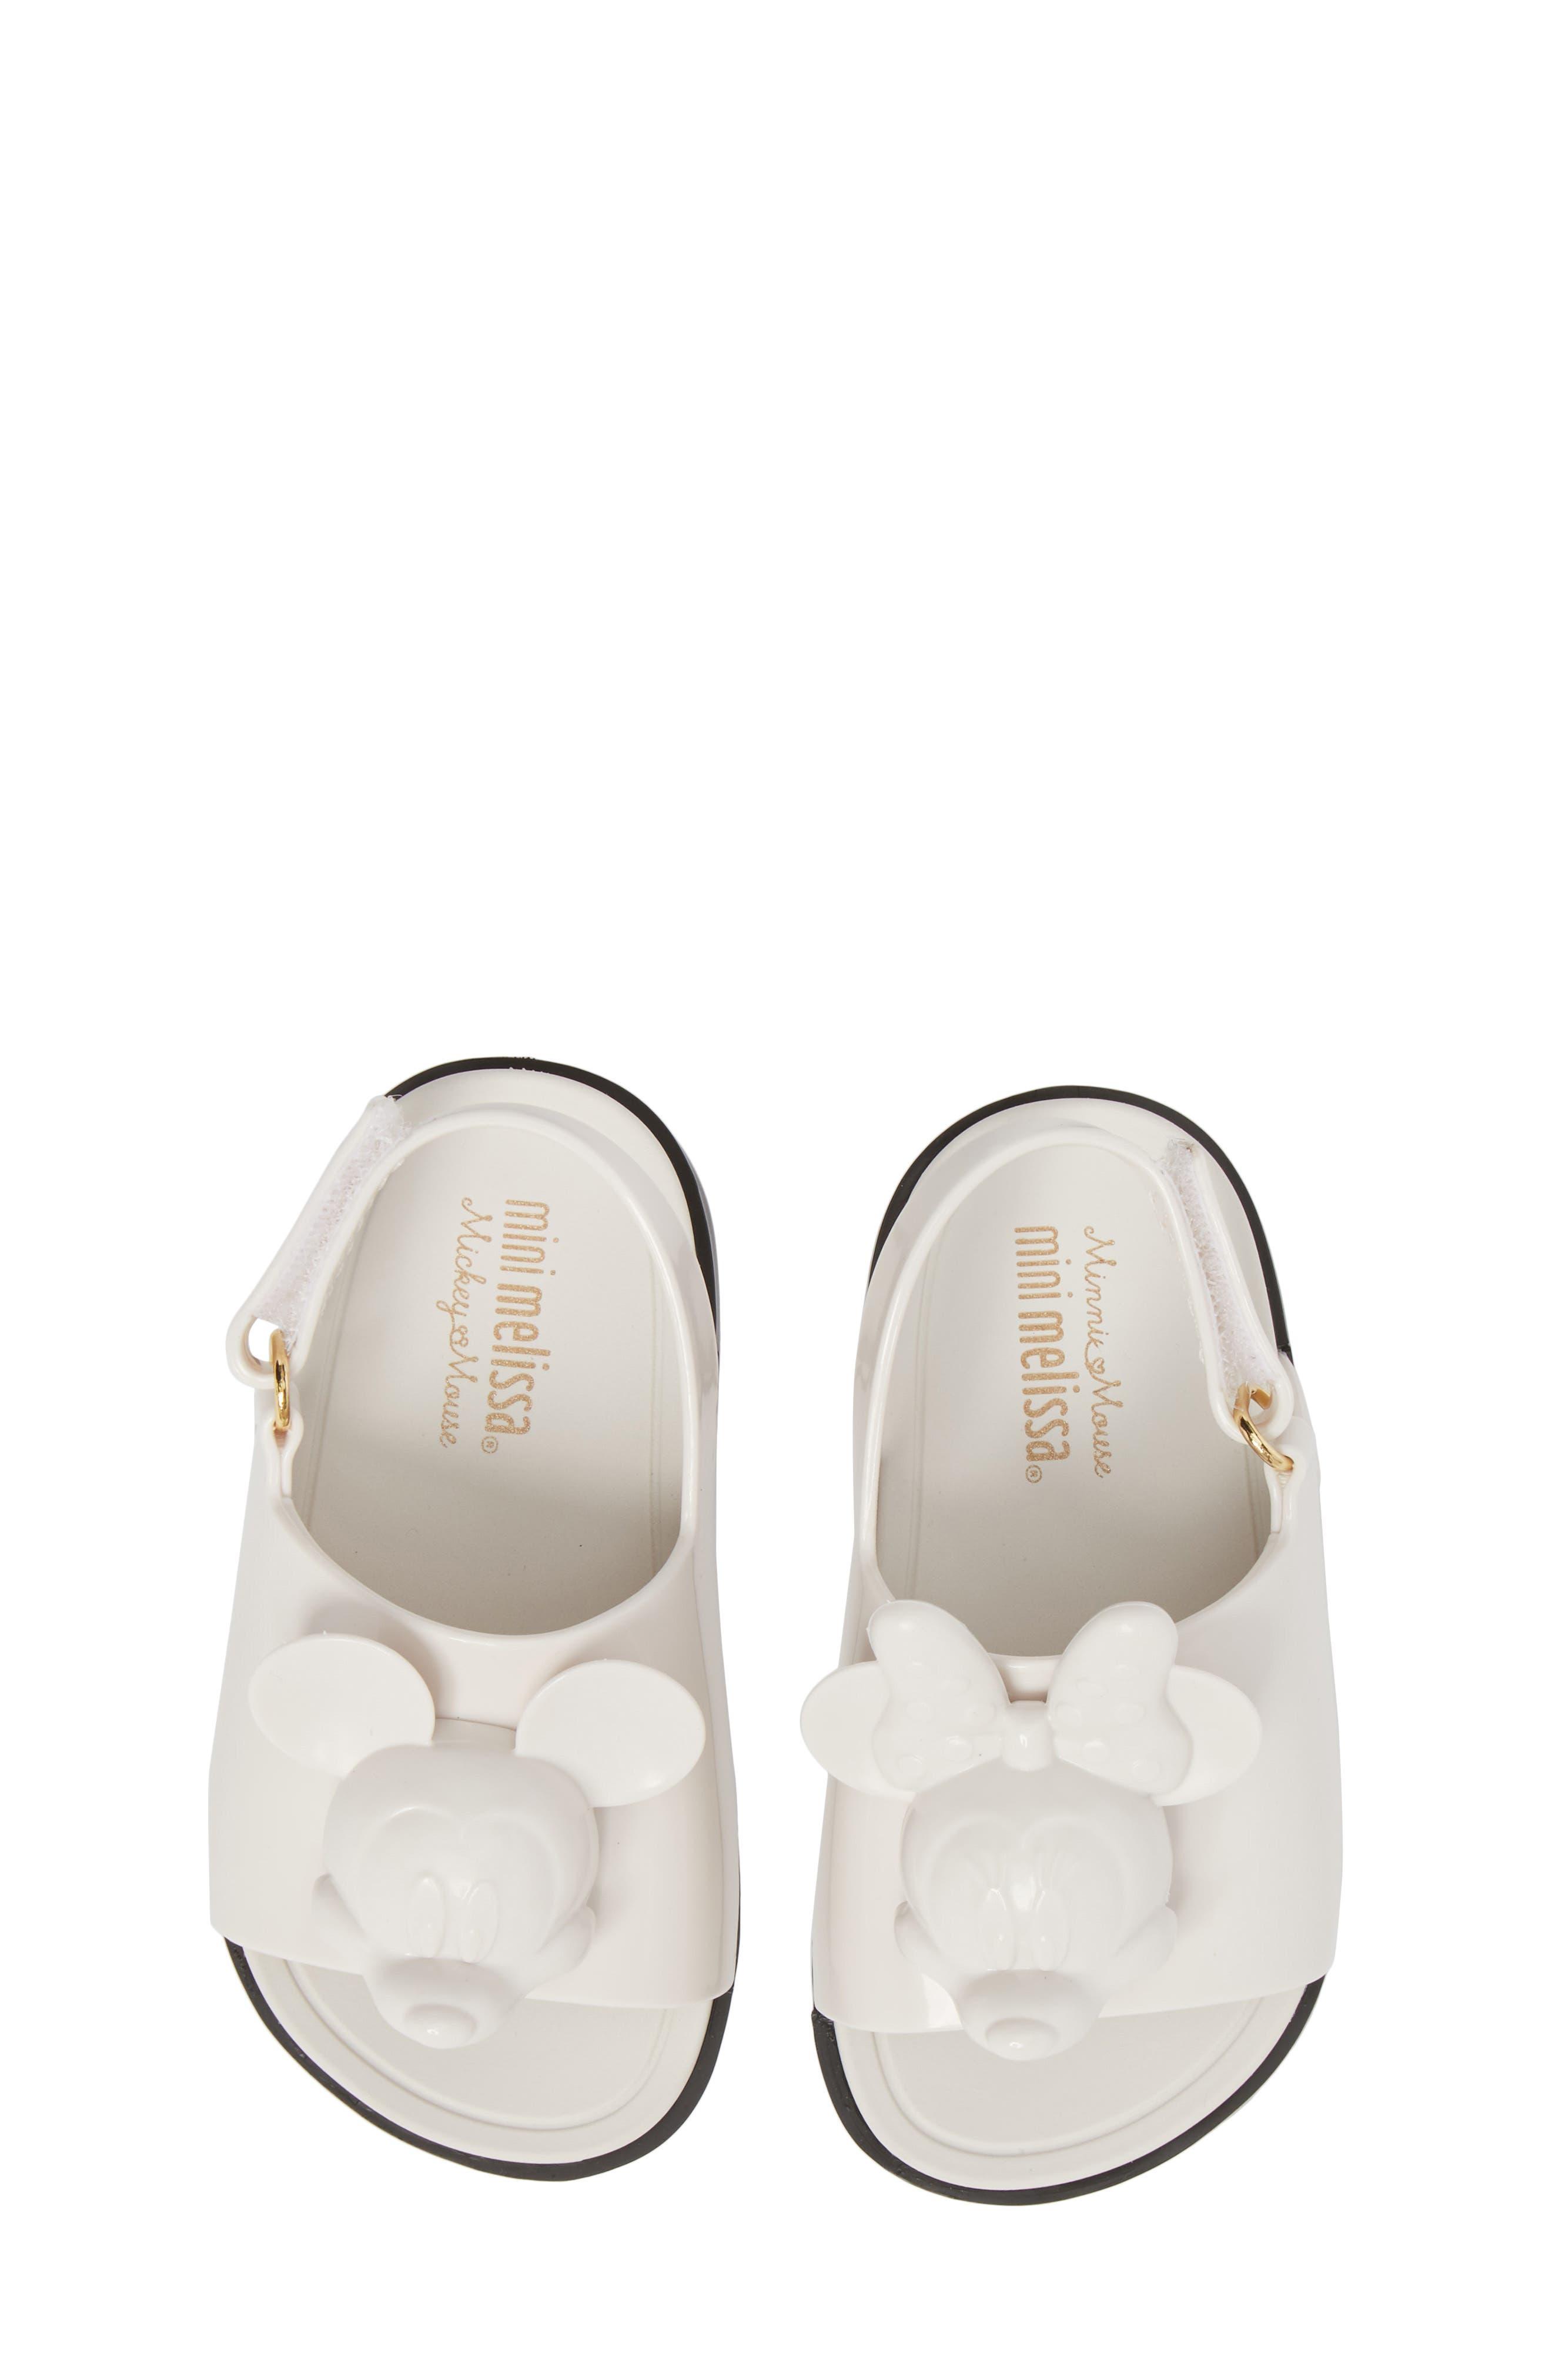 Disney<sup>®</sup> Mini Beach Sandal,                             Main thumbnail 2, color,